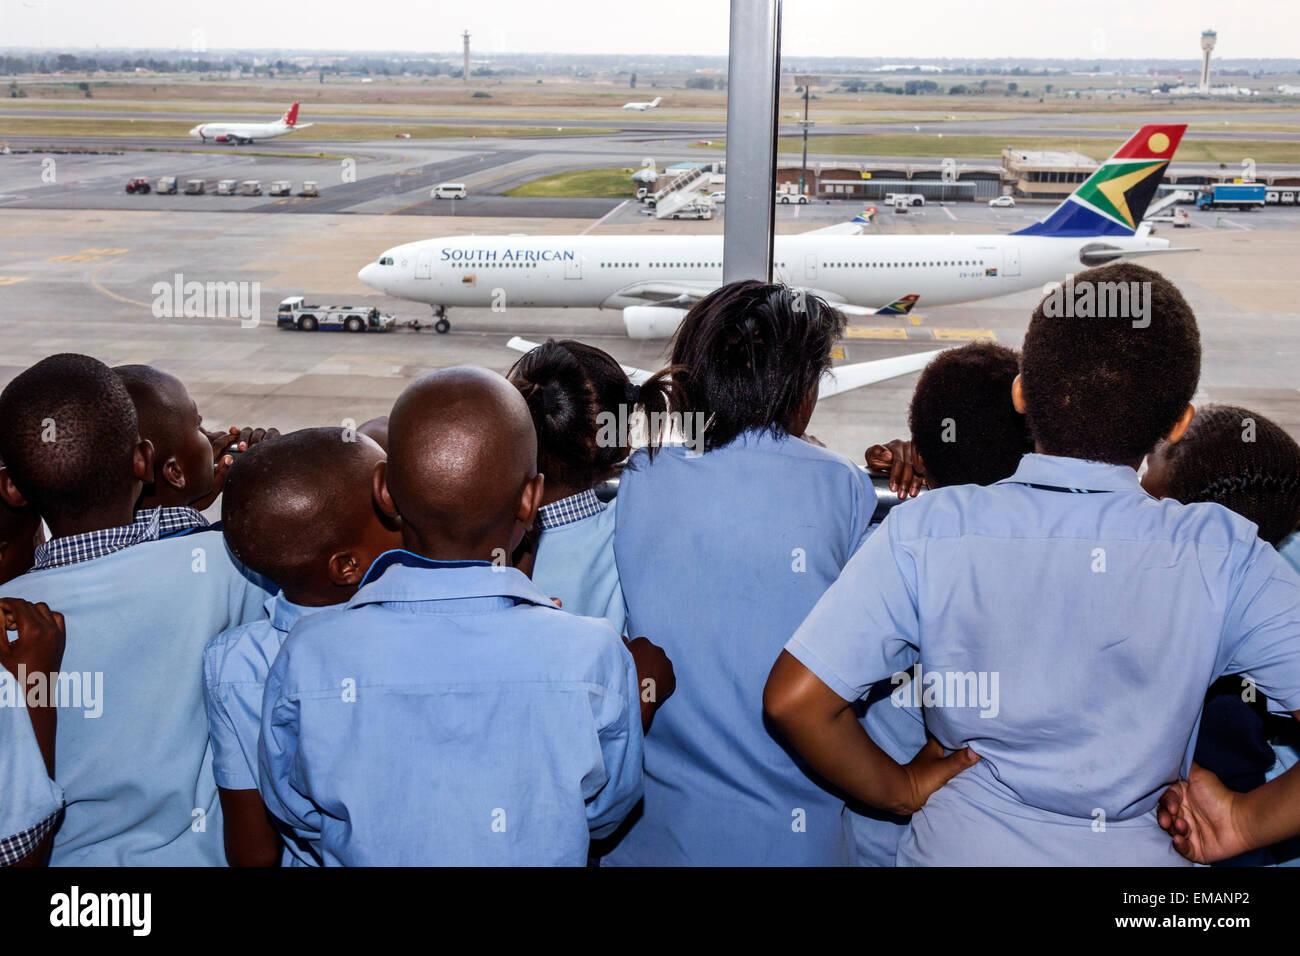 Johannesburgo, Sudáfrica African O. R. Tambo International Airport terminal concourse gate área campo Imagen De Stock